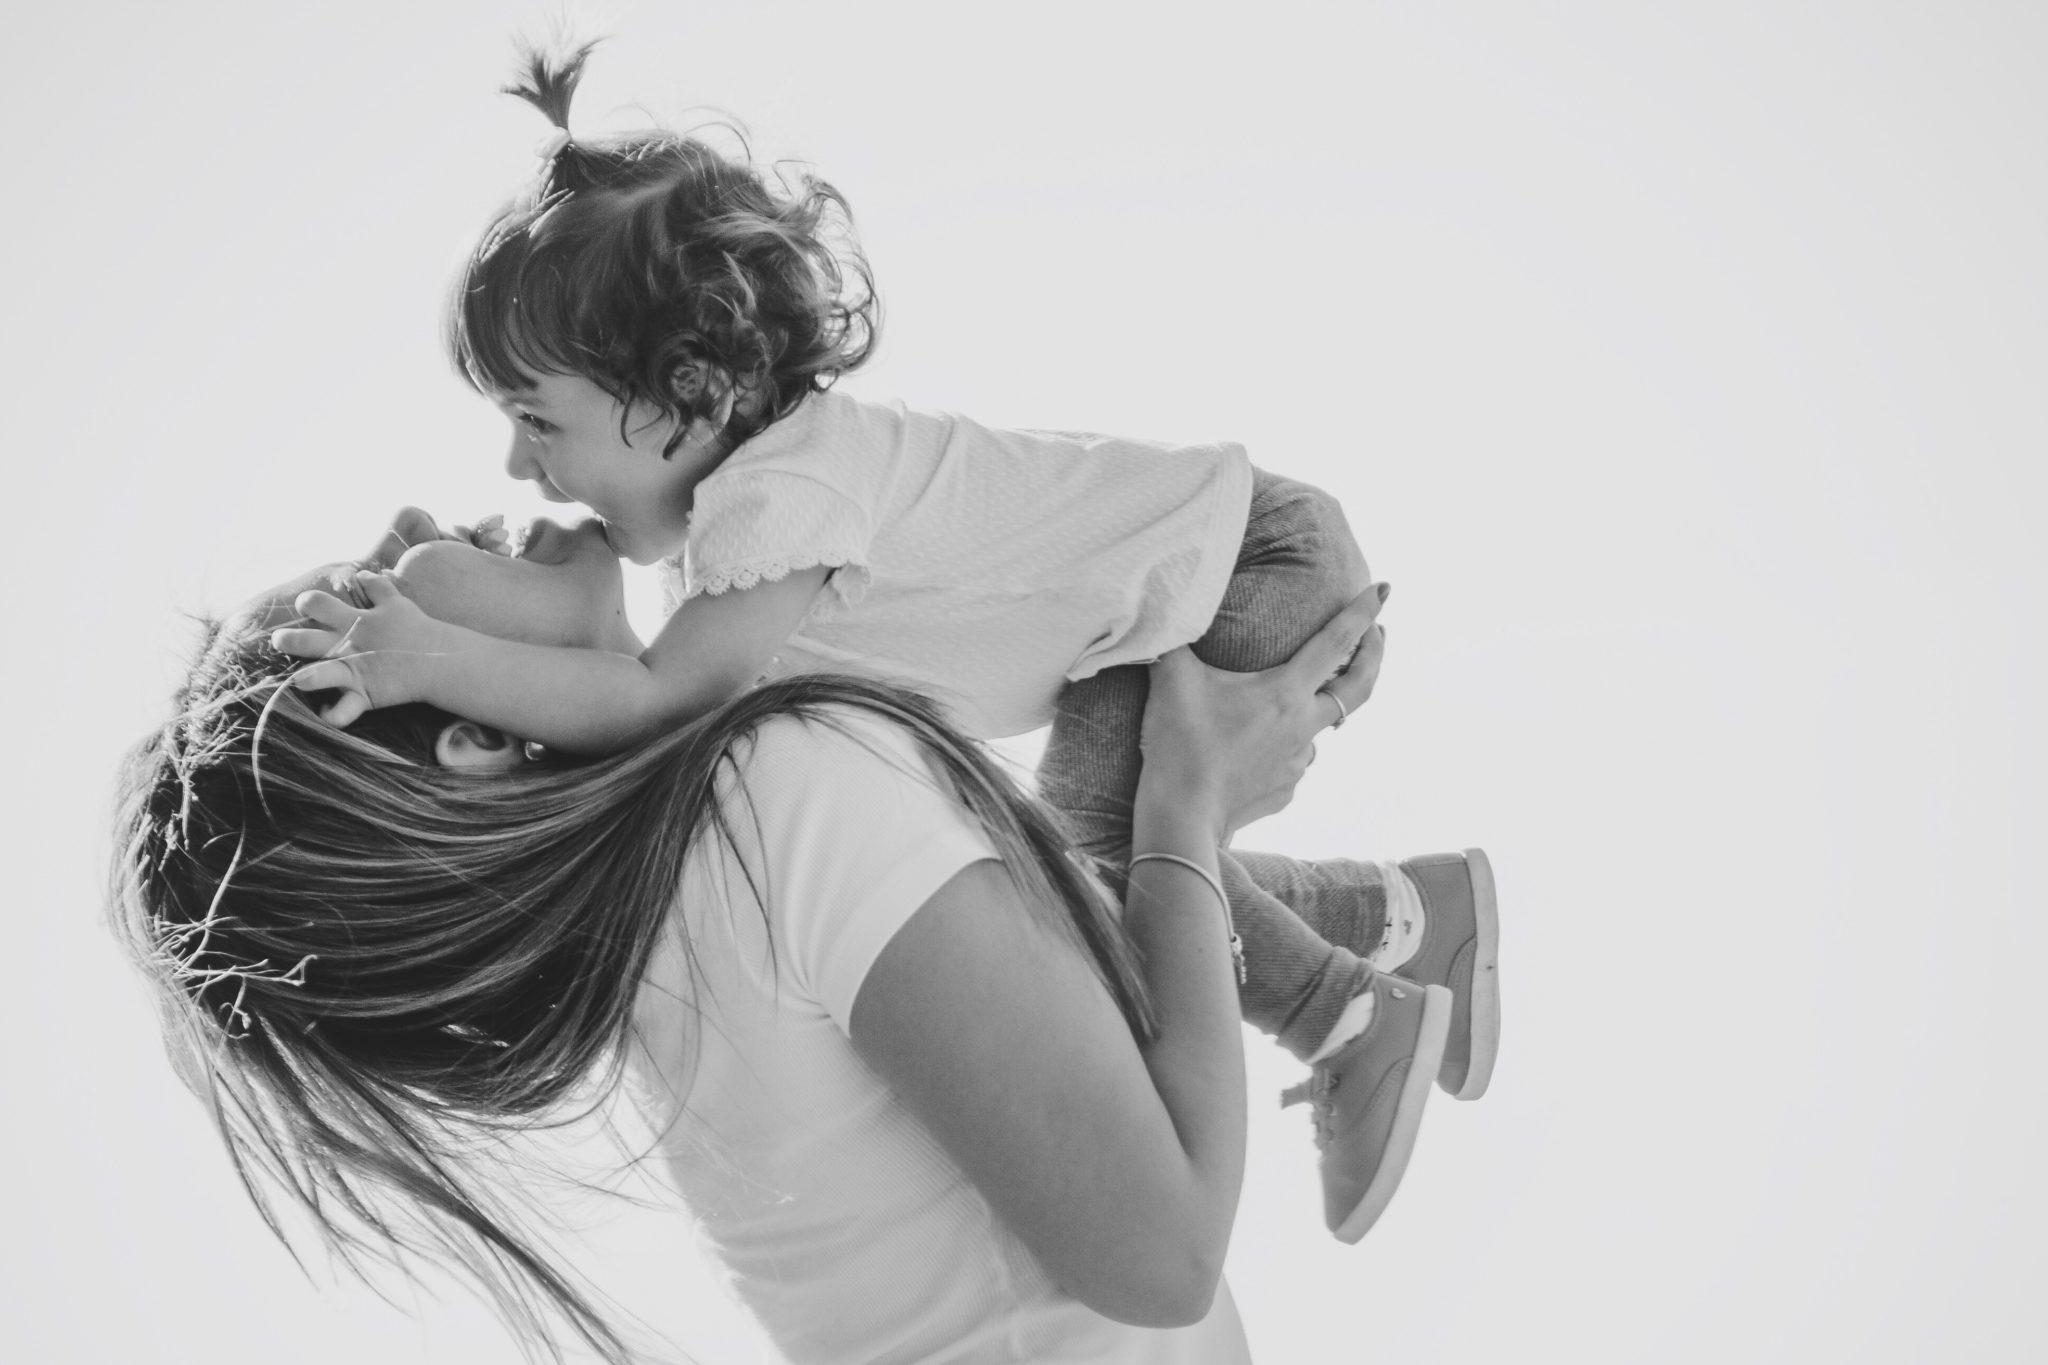 devenir maman débutante erreur